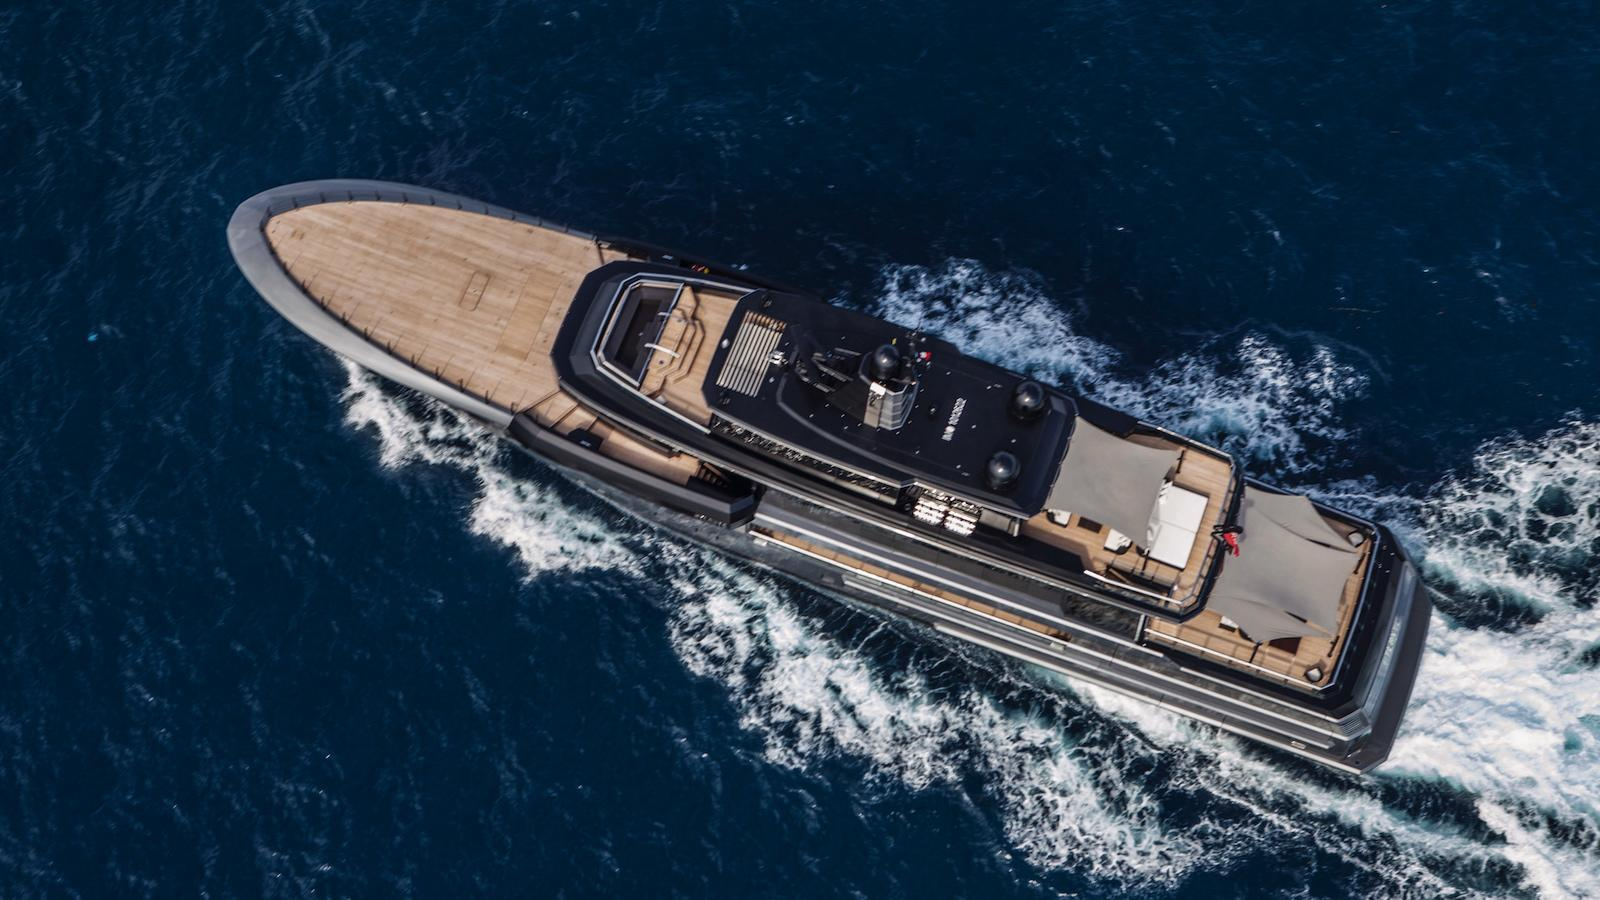 Atlante-motor-yacht-crn-2015-55m-aerial